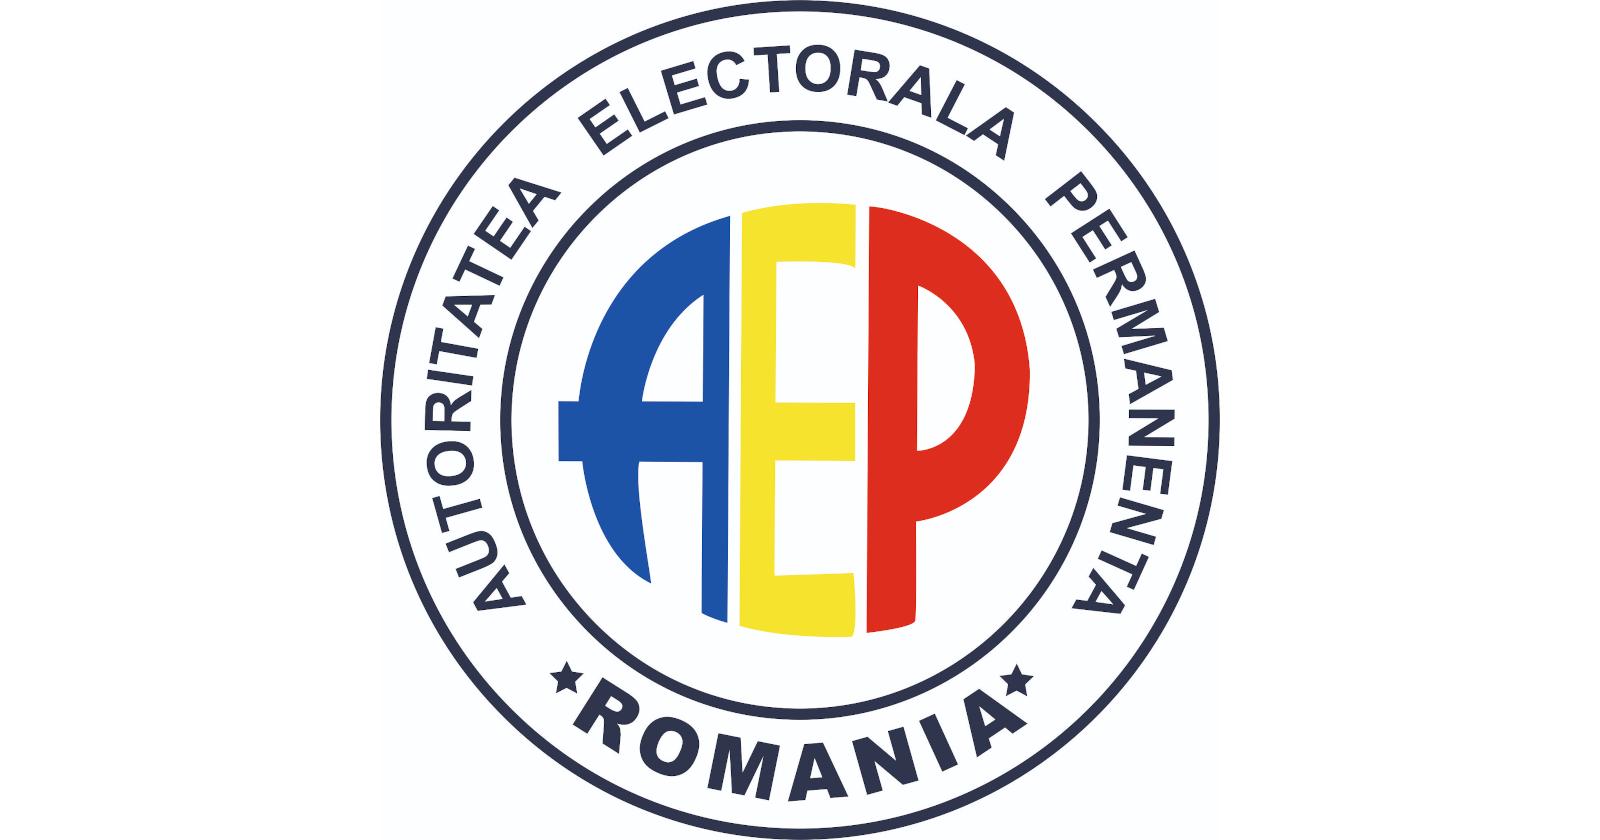 https://ziarul.romania-rationala.ro/control/articole/articole/autoritatea-electorala-permanenta.jpg